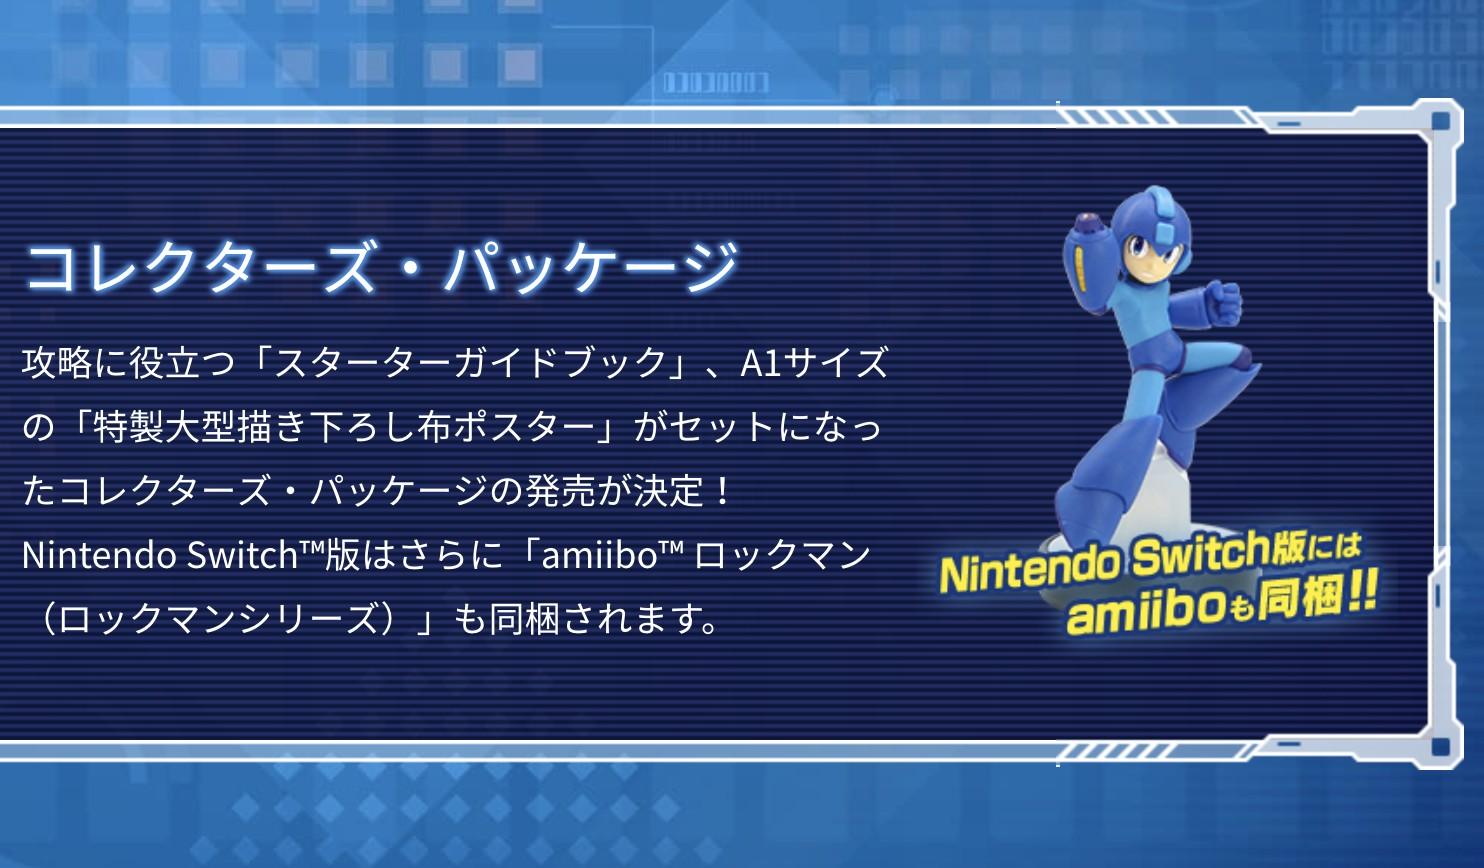 mega man 11 amiibo announced for japan nintendosoup